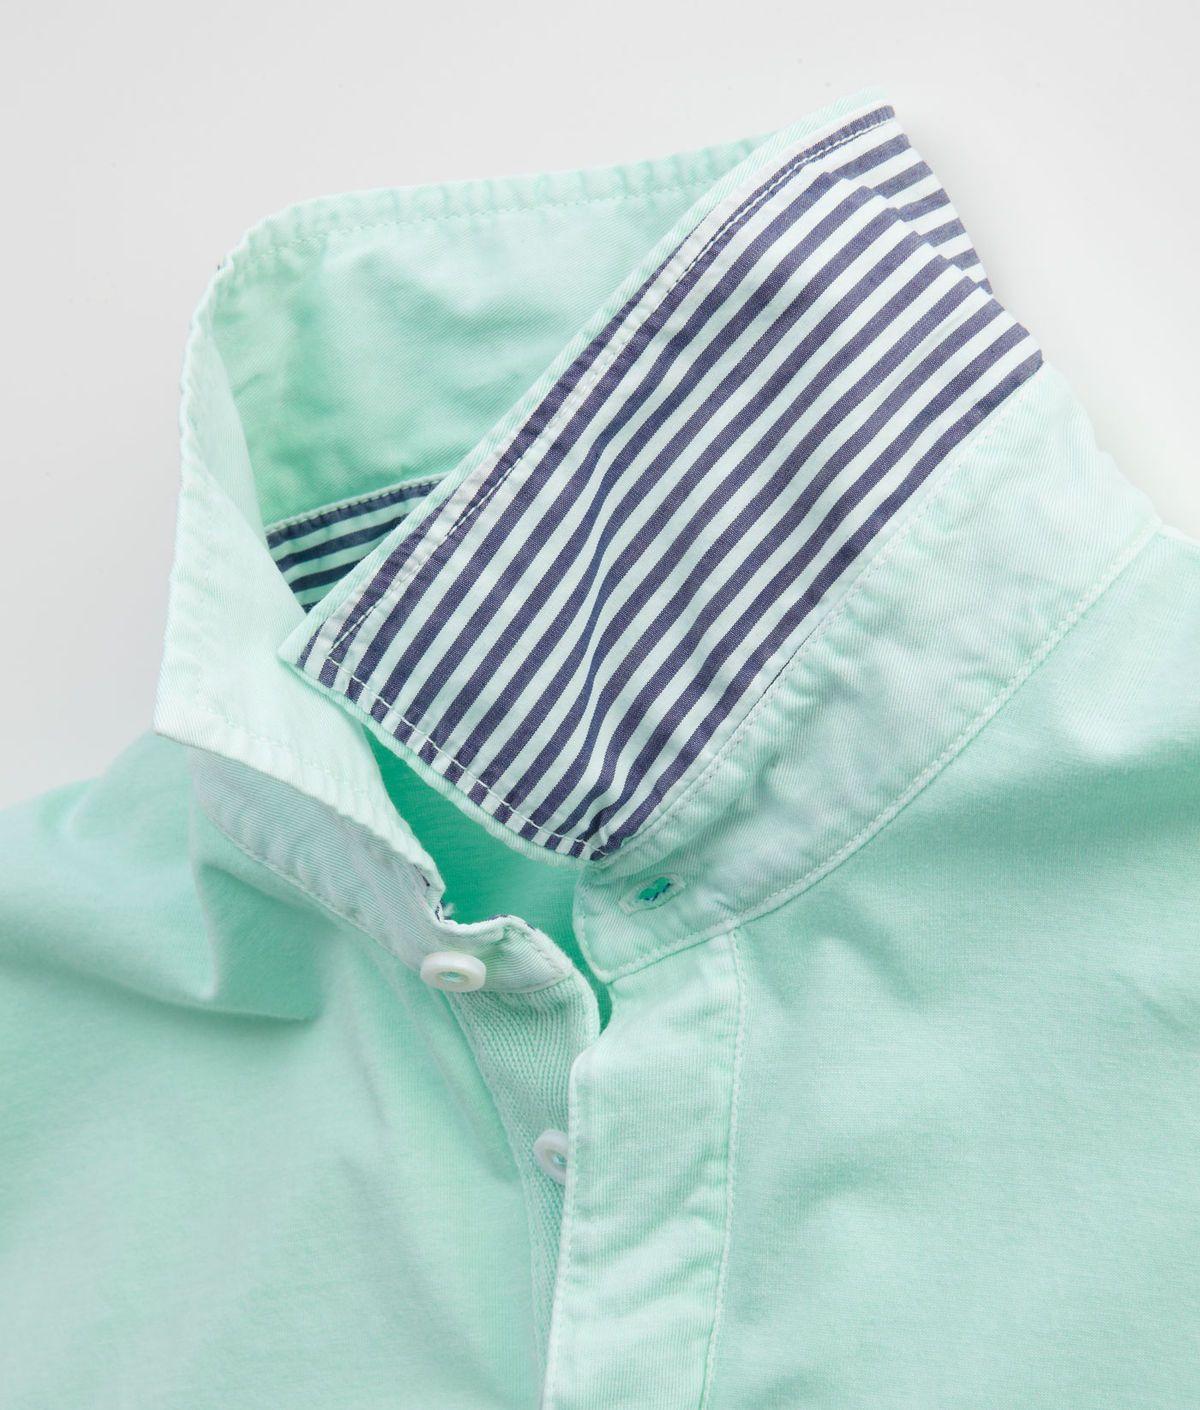 Mint Oxford, striped collar